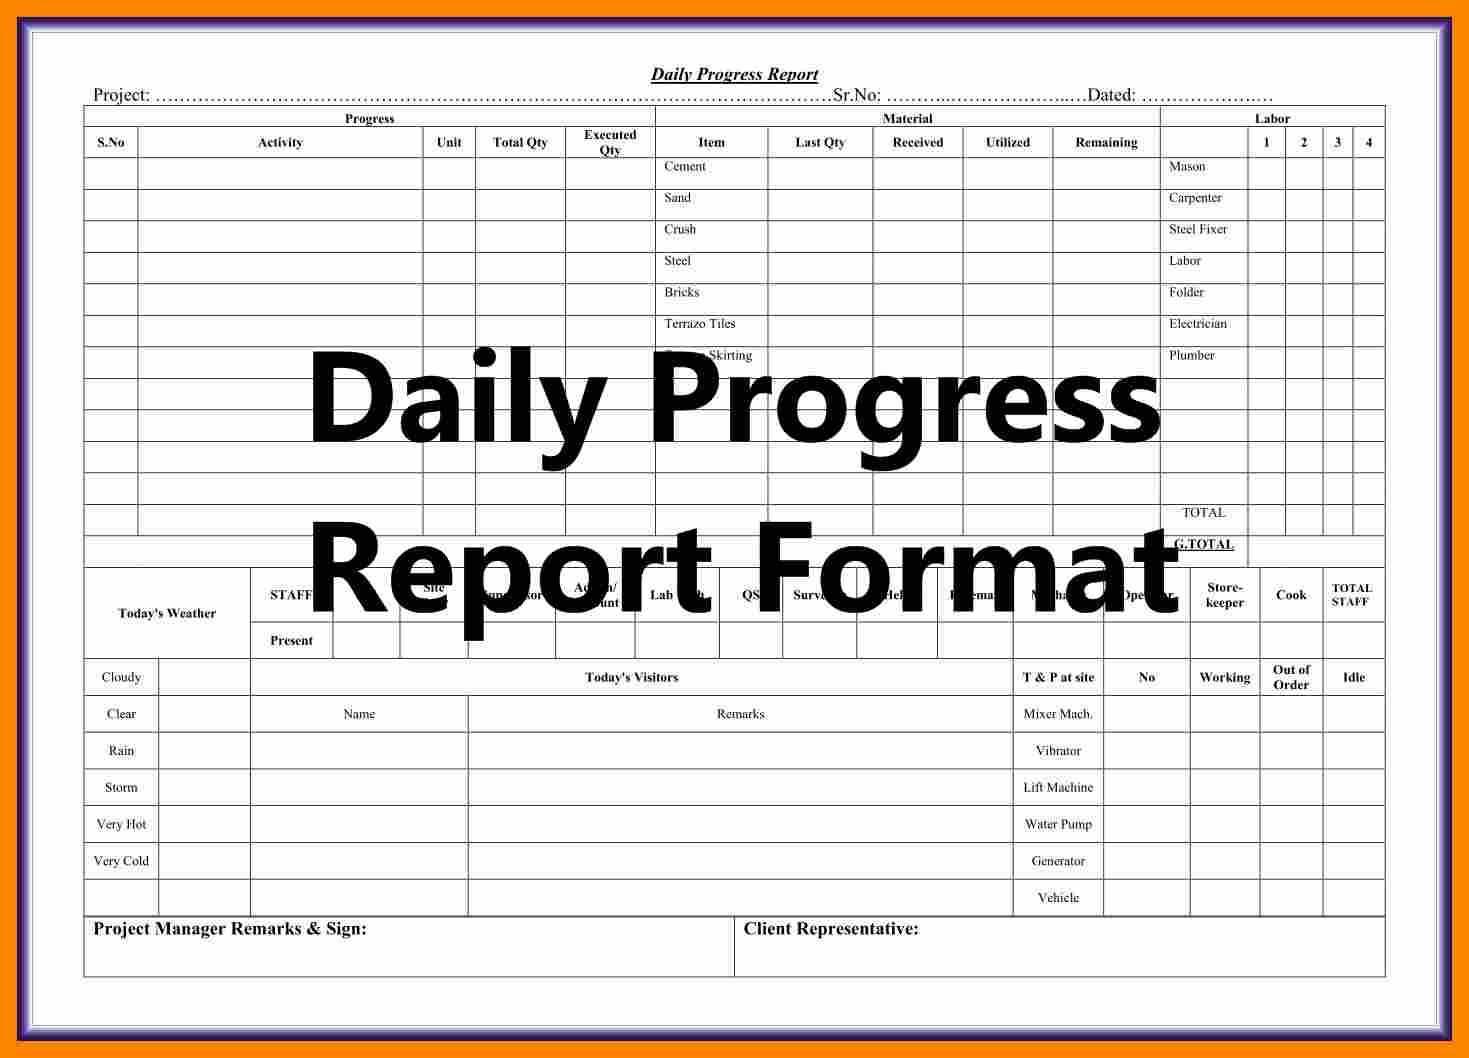 004 Template Ideas Construction Daily Progress Report Inside Construction Daily Progress Report Template